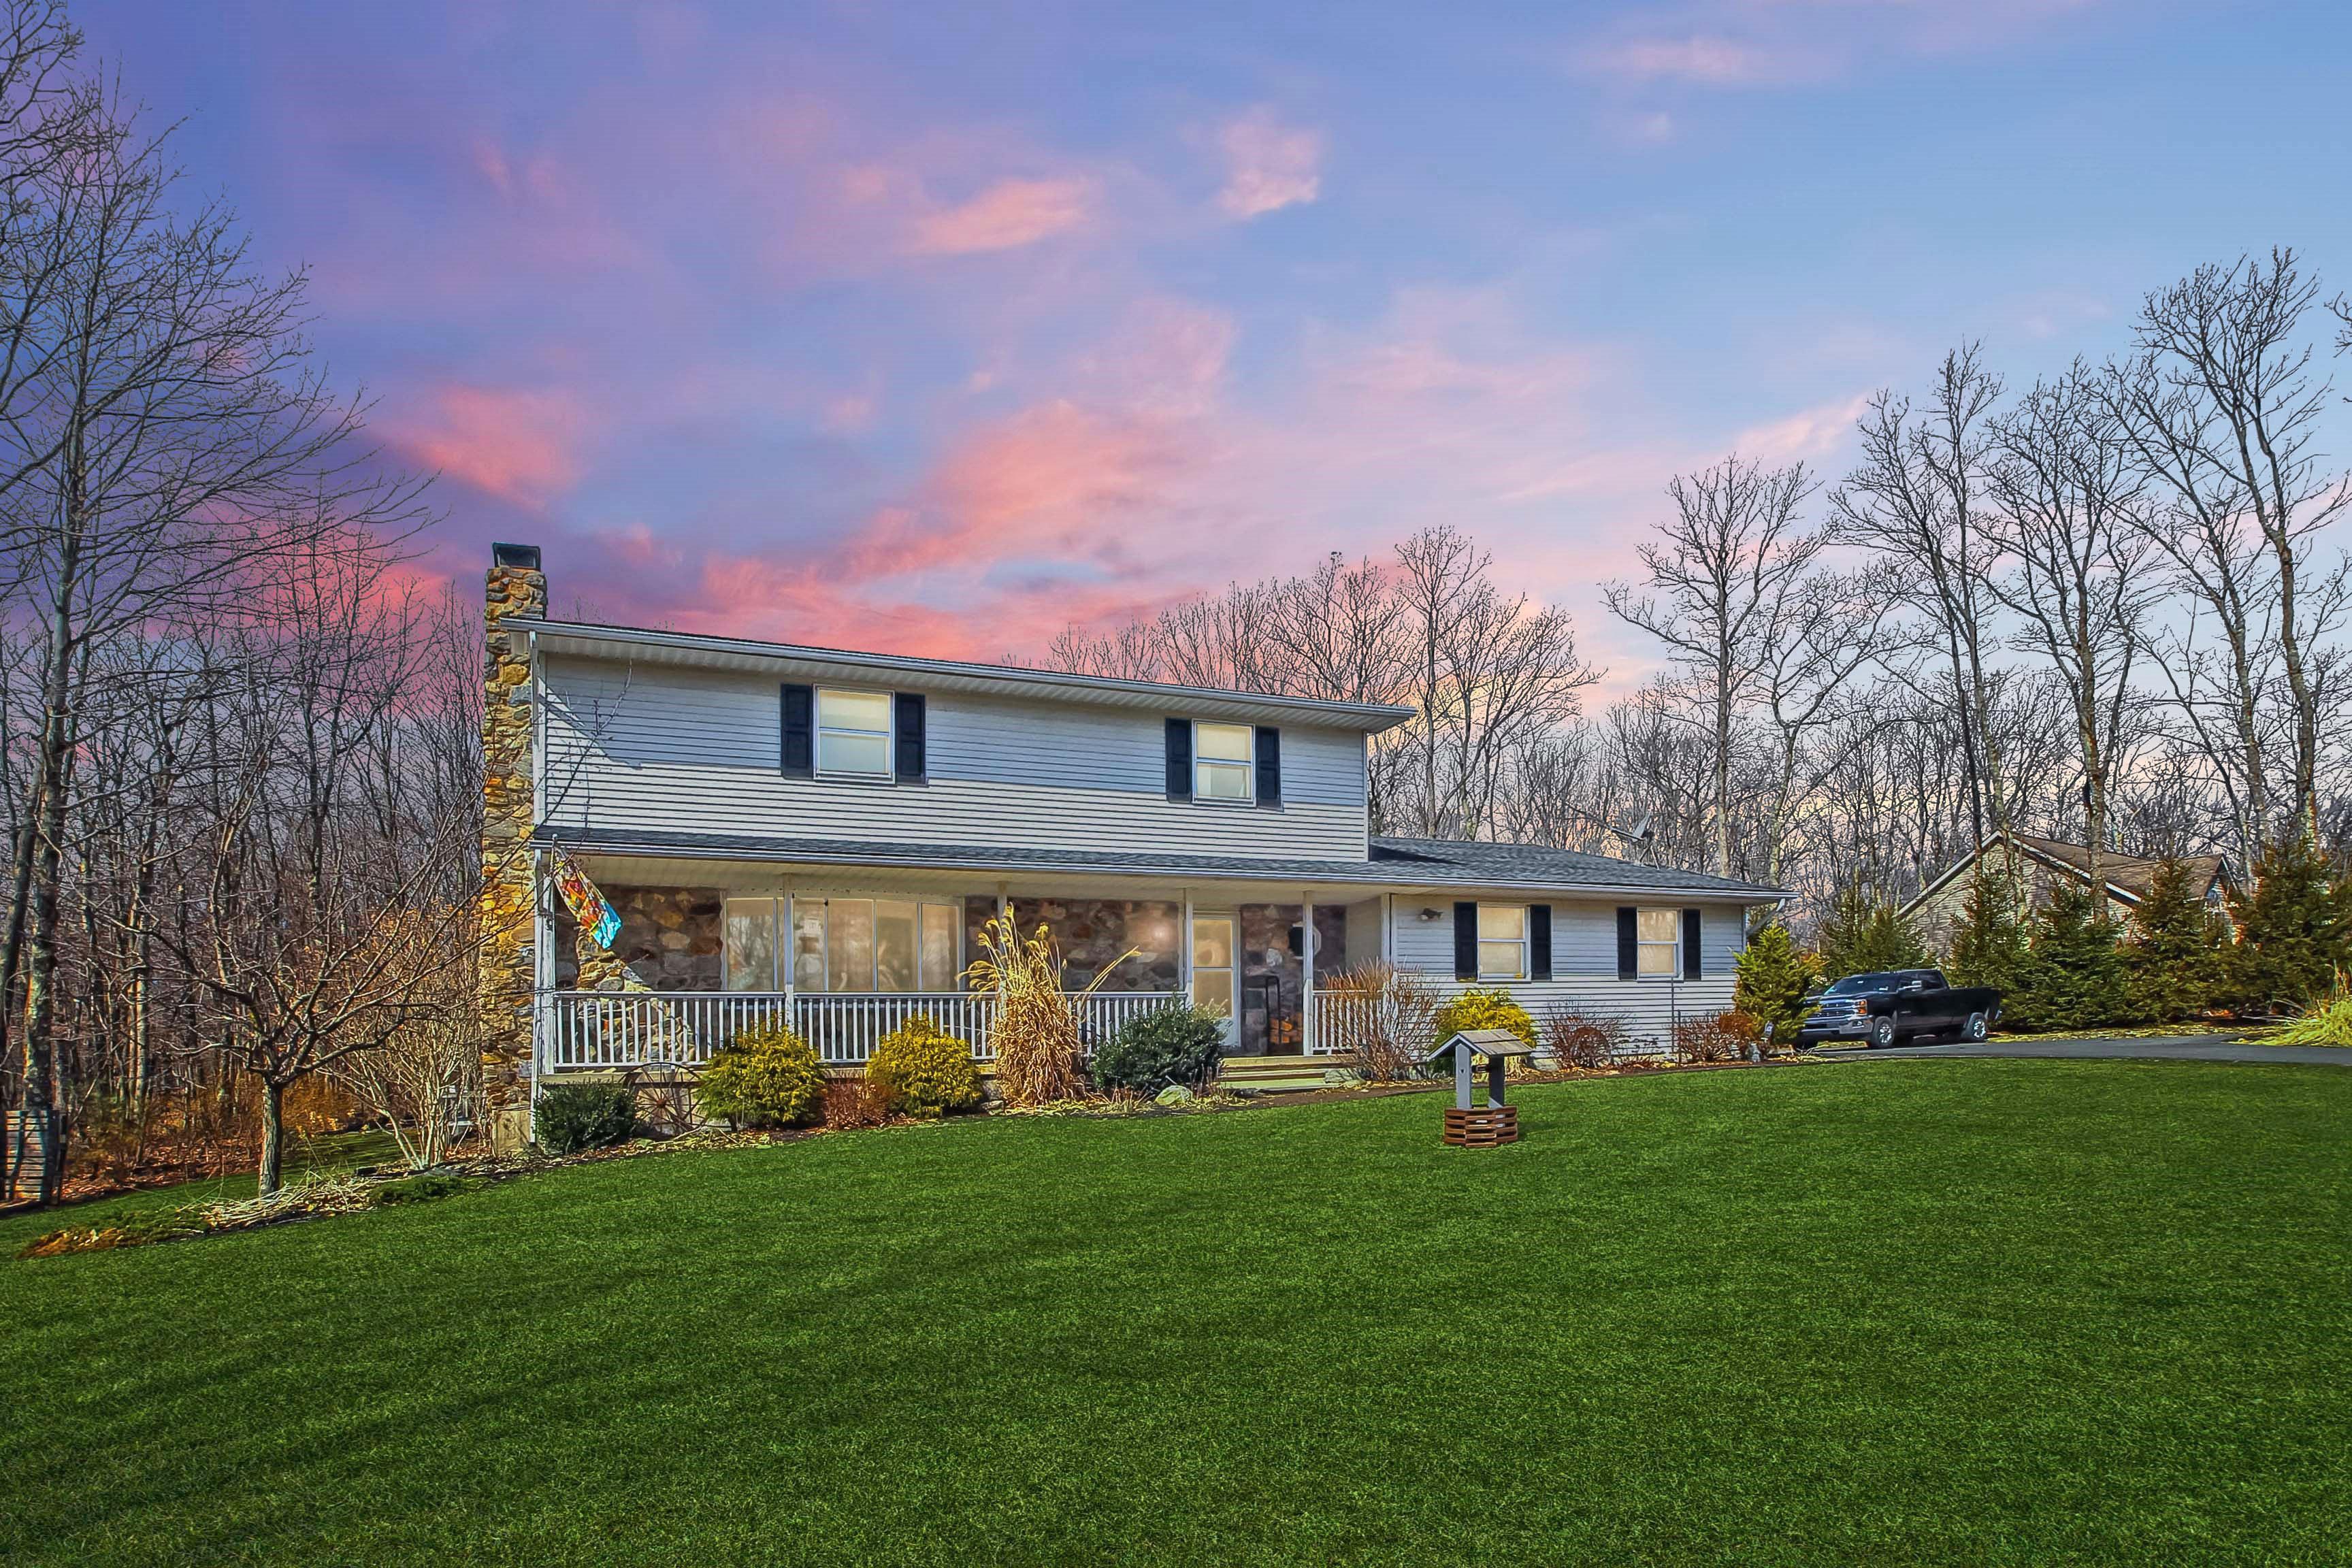 Saylorsburg Home For Sale Just Listed!